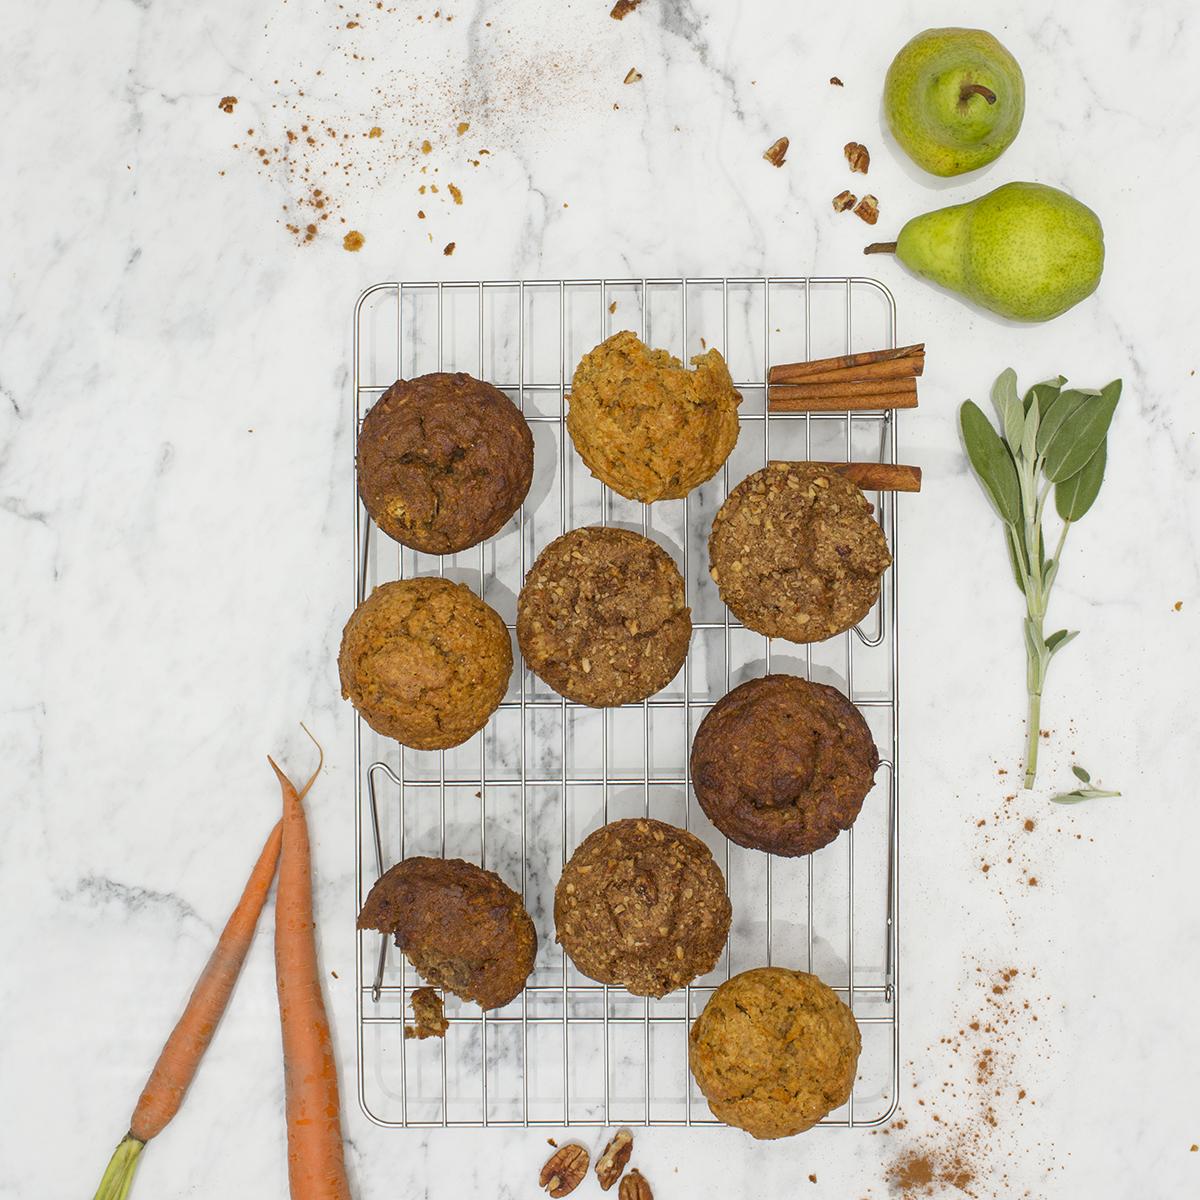 Assortment of Wheat Free Muffins